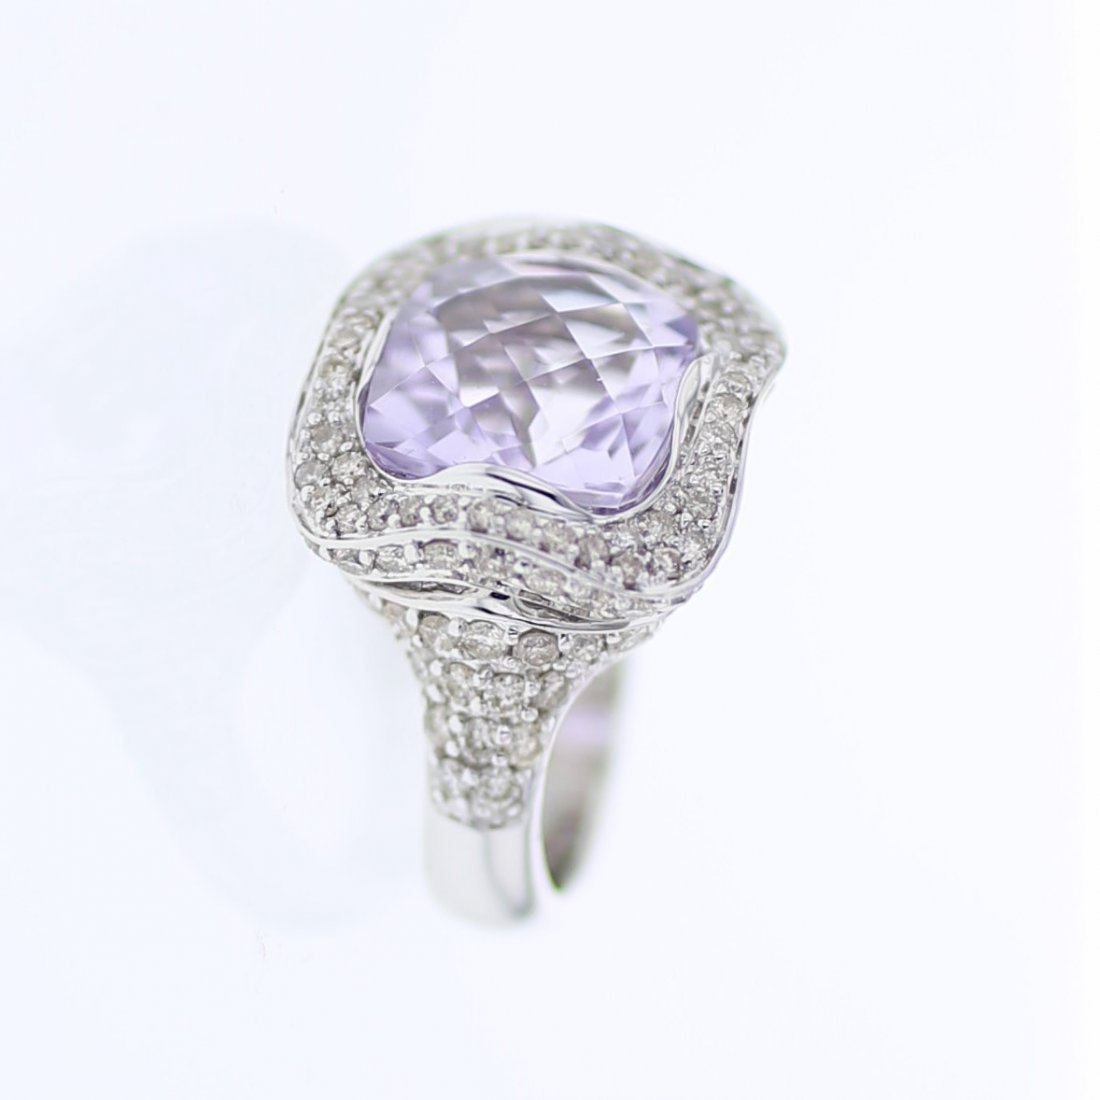 Cushion Bezel-set Pink Amethyst Diamond Ring in 14K